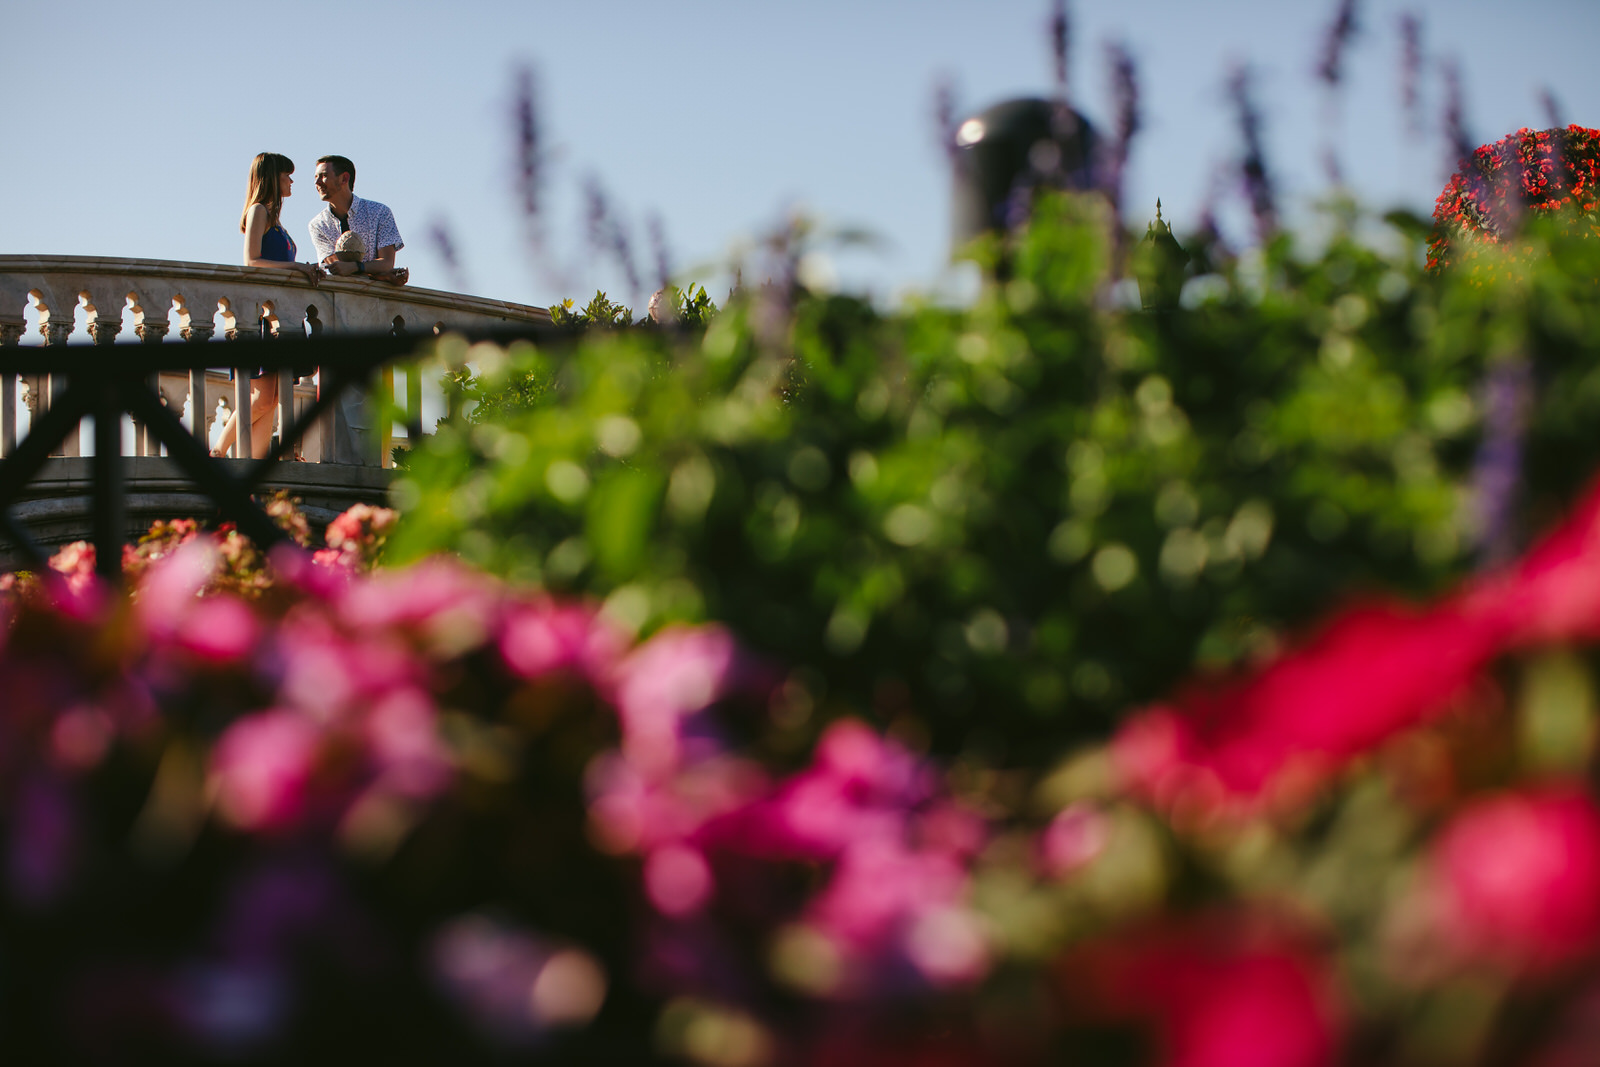 epcot-engagement-fun-tiny-house-photo-garden-festival.jpg